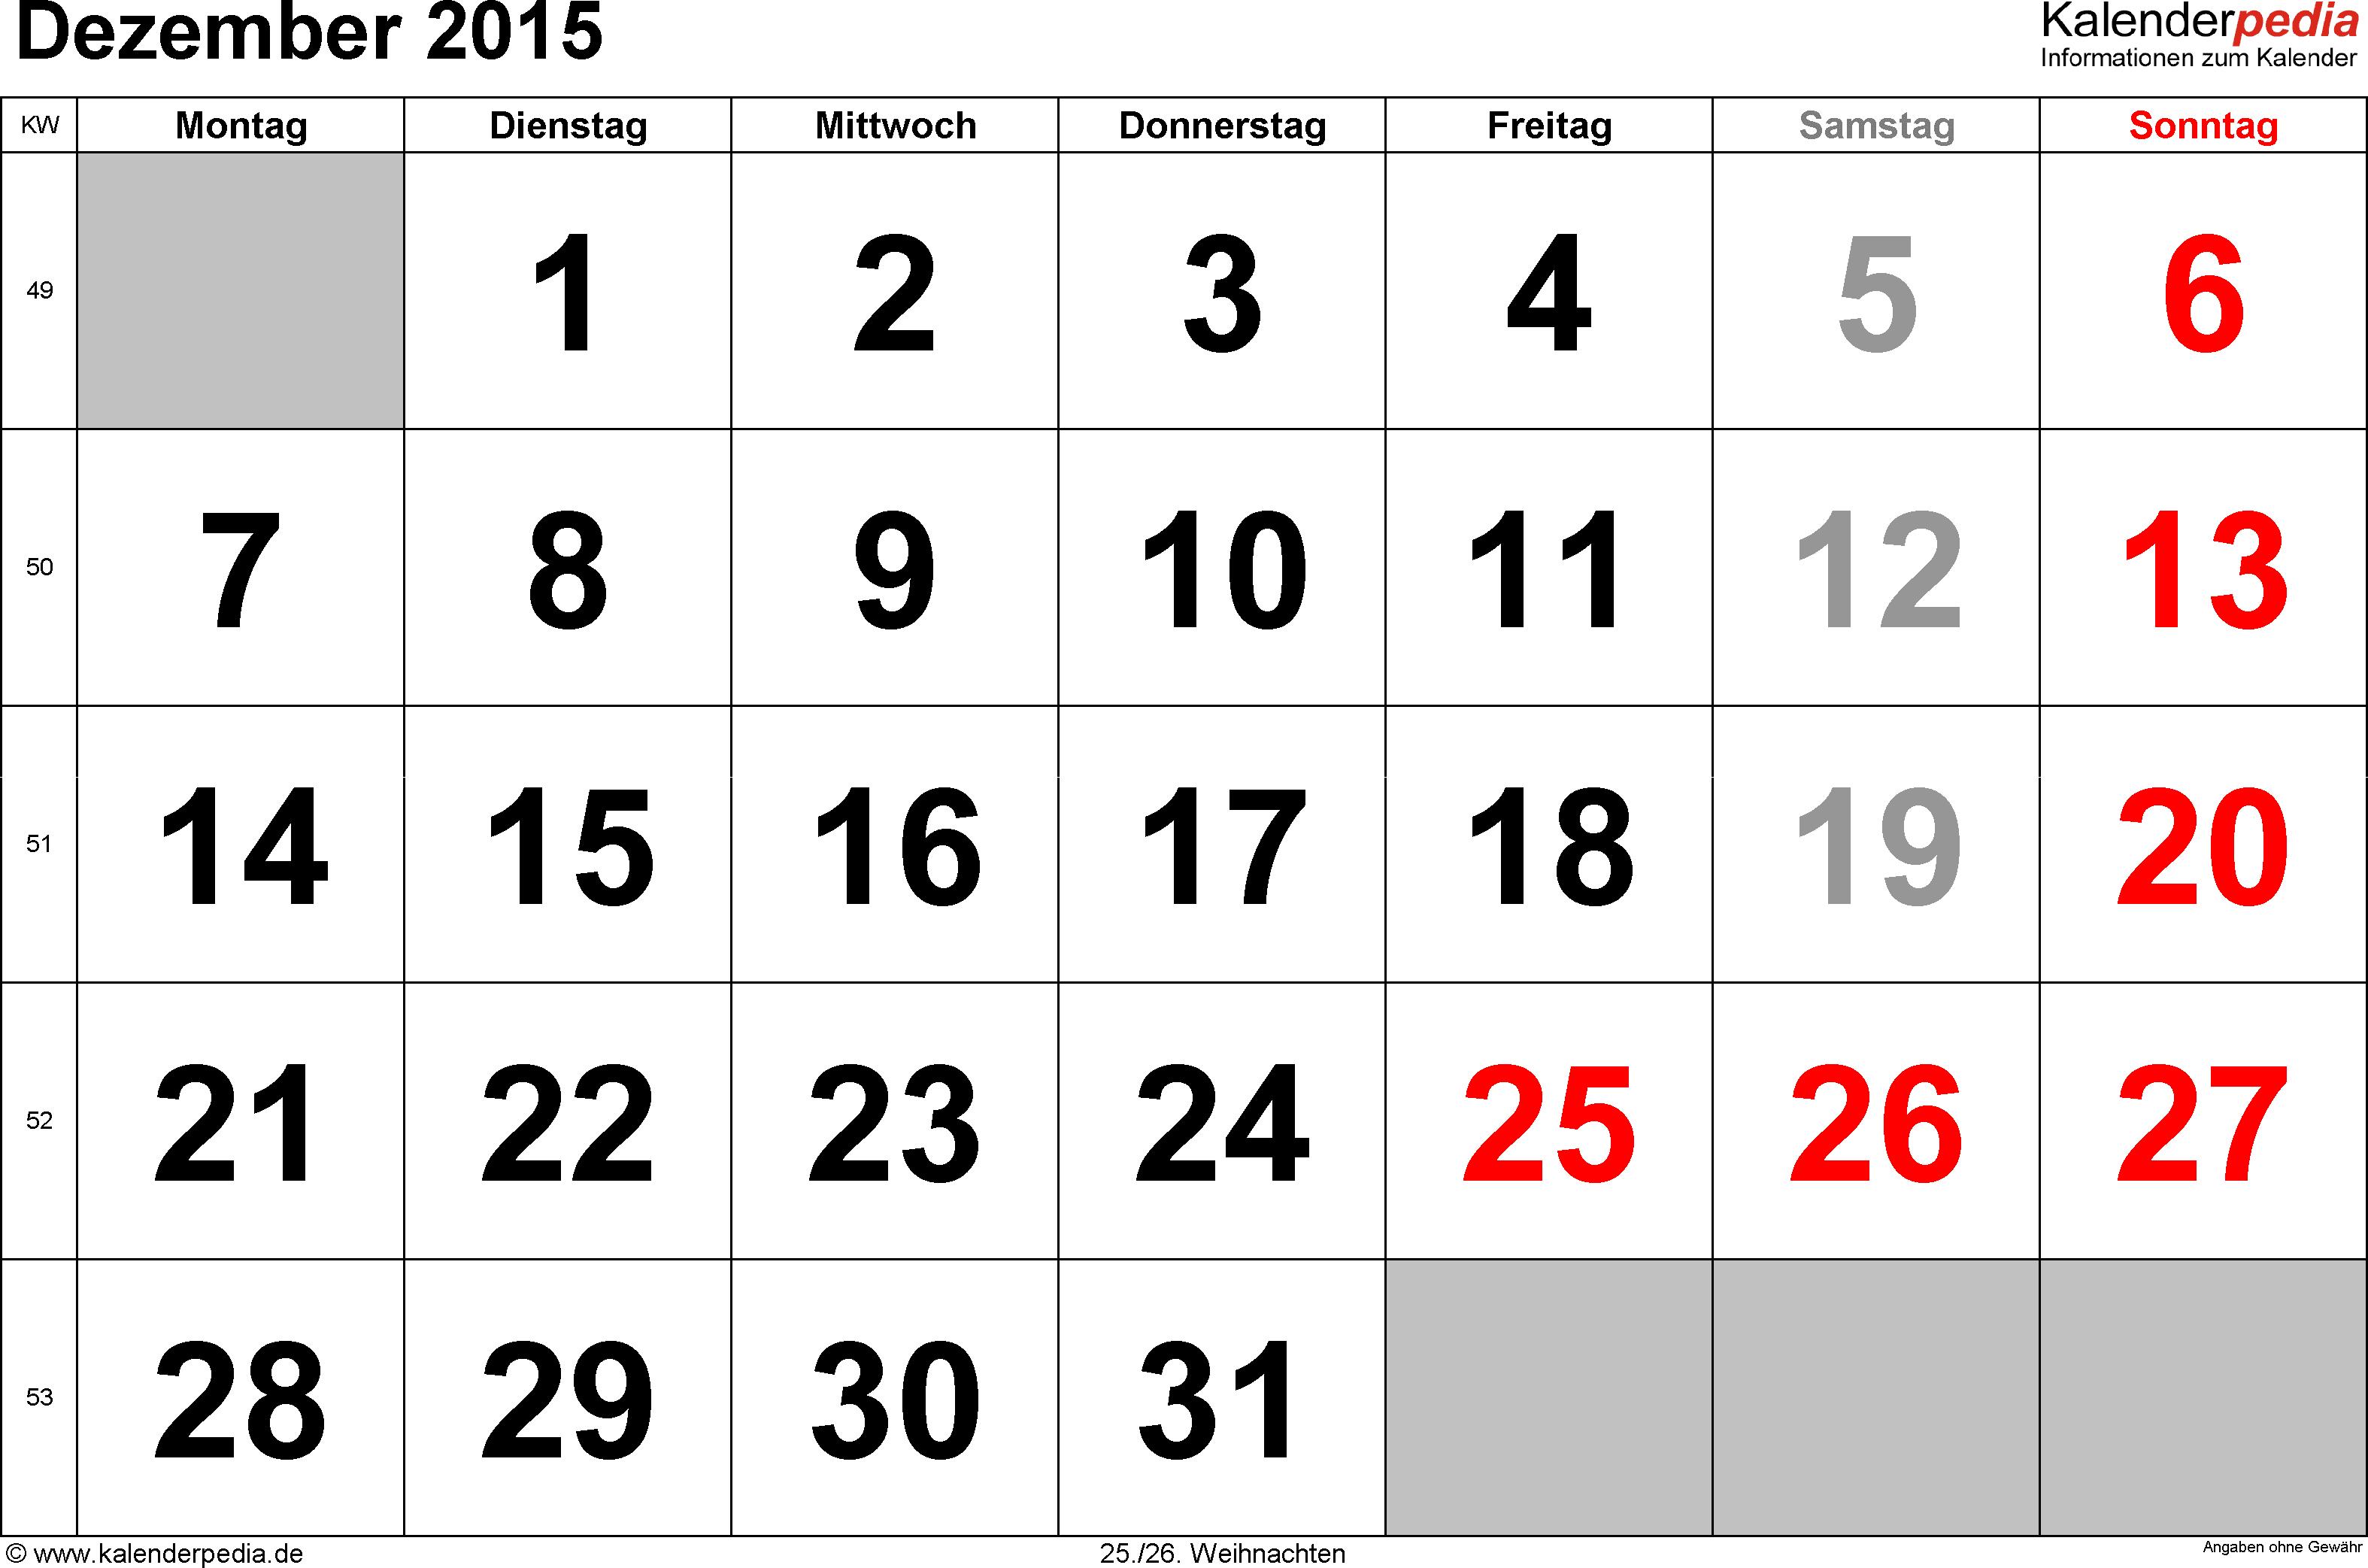 Kalender Dezember 2015 im Querformat, grosse Ziffern